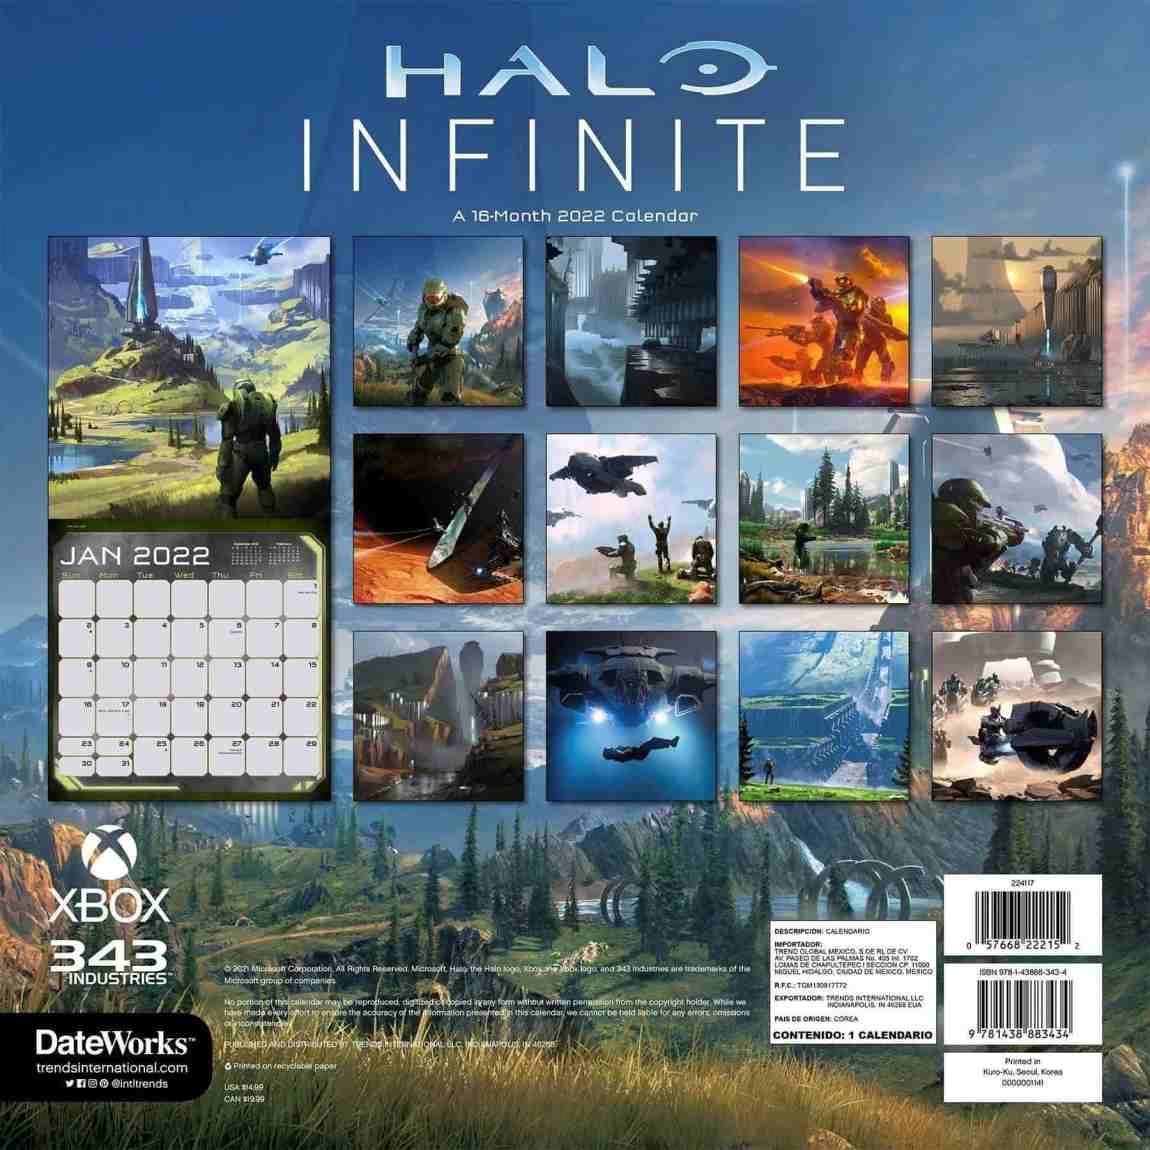 Halo Infinite 2022 Calendar Reveals Never-Before-Seen Images 1